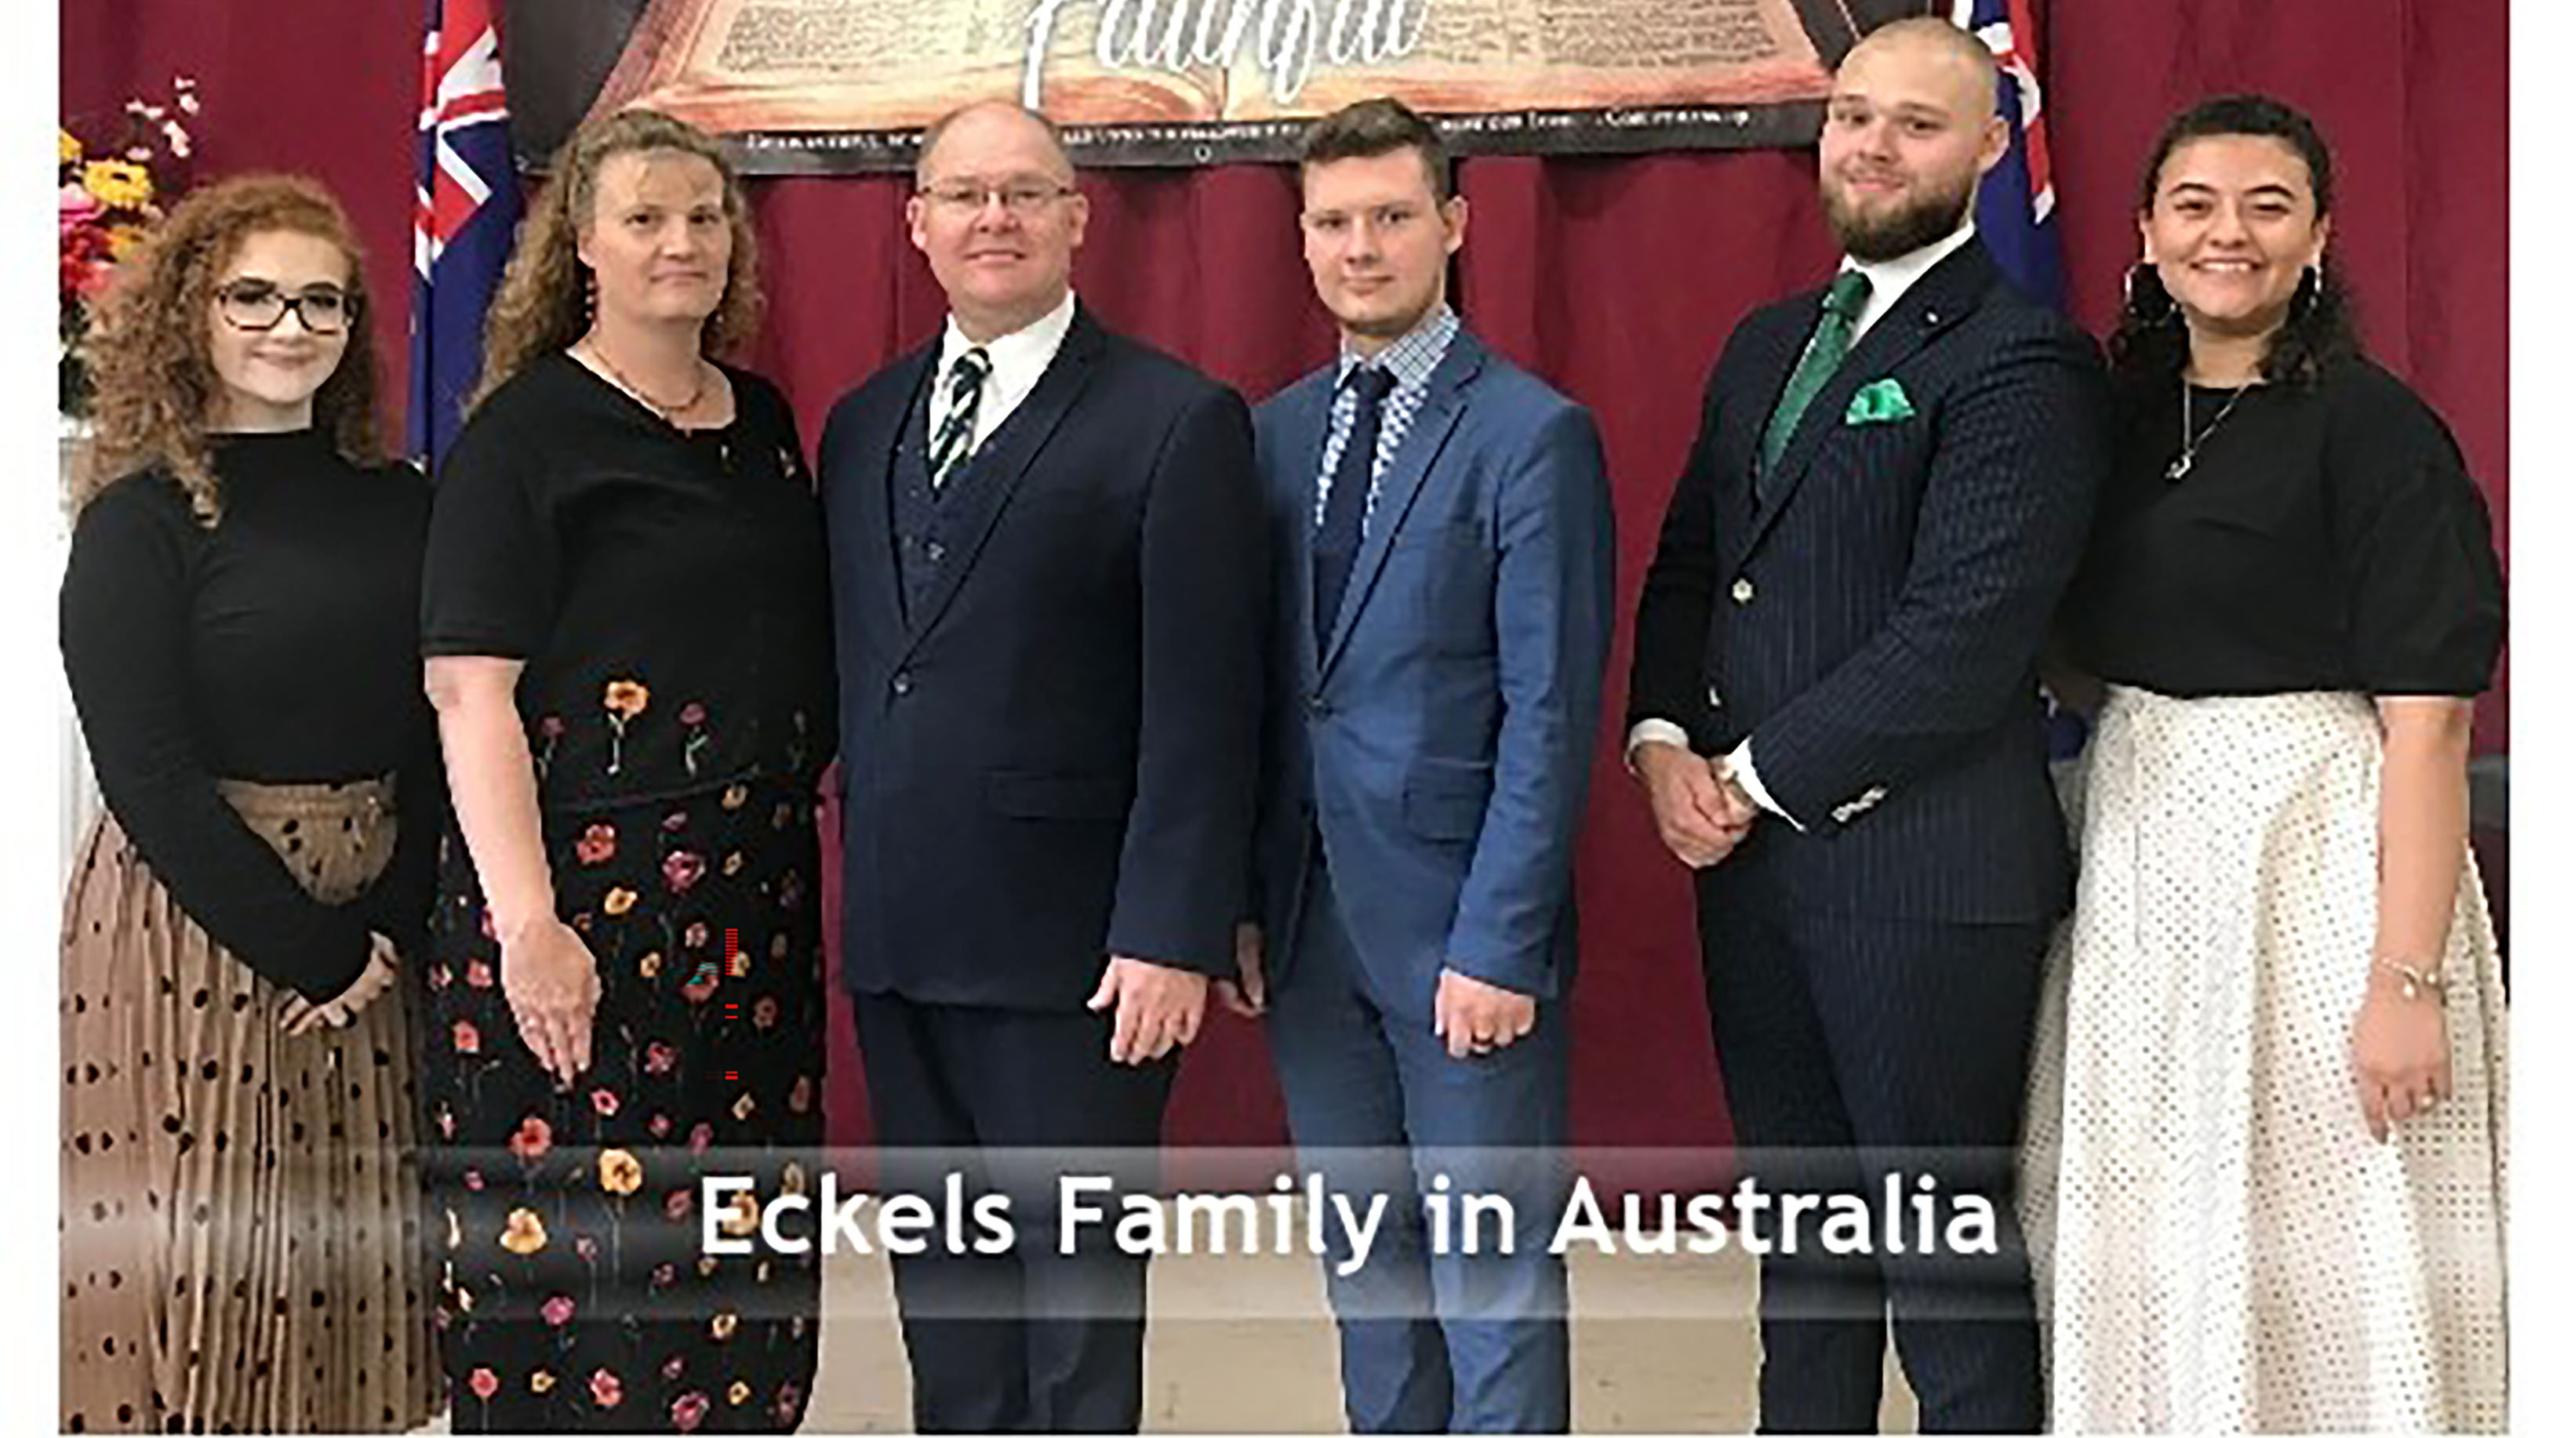 ECKELS FAMILY